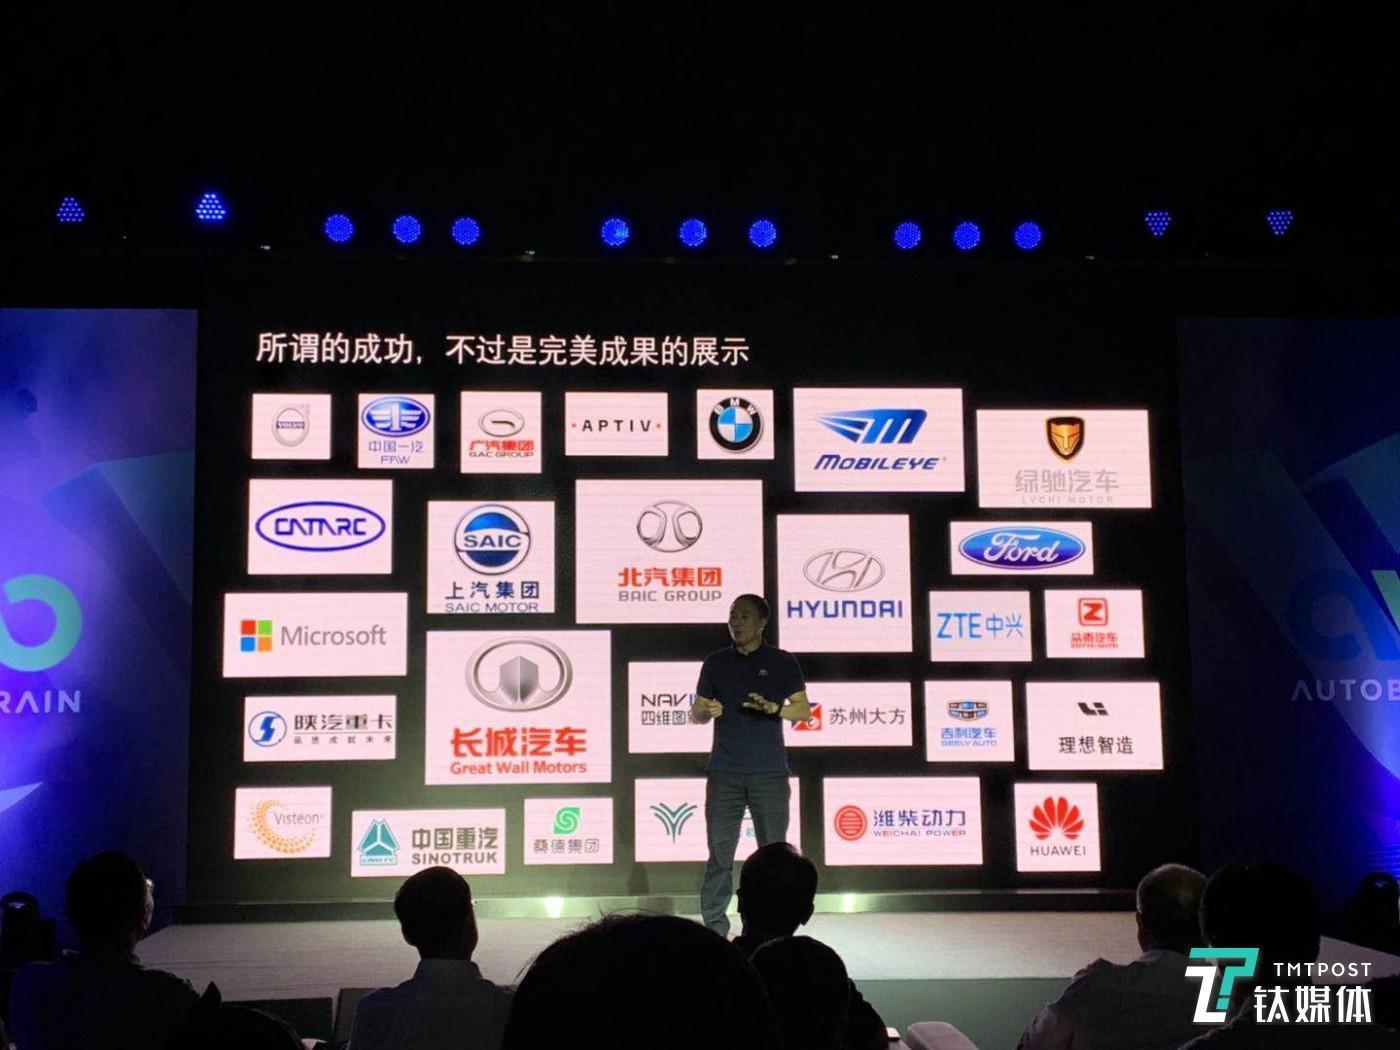 AutoBrain在发布会上公布的合作方名单